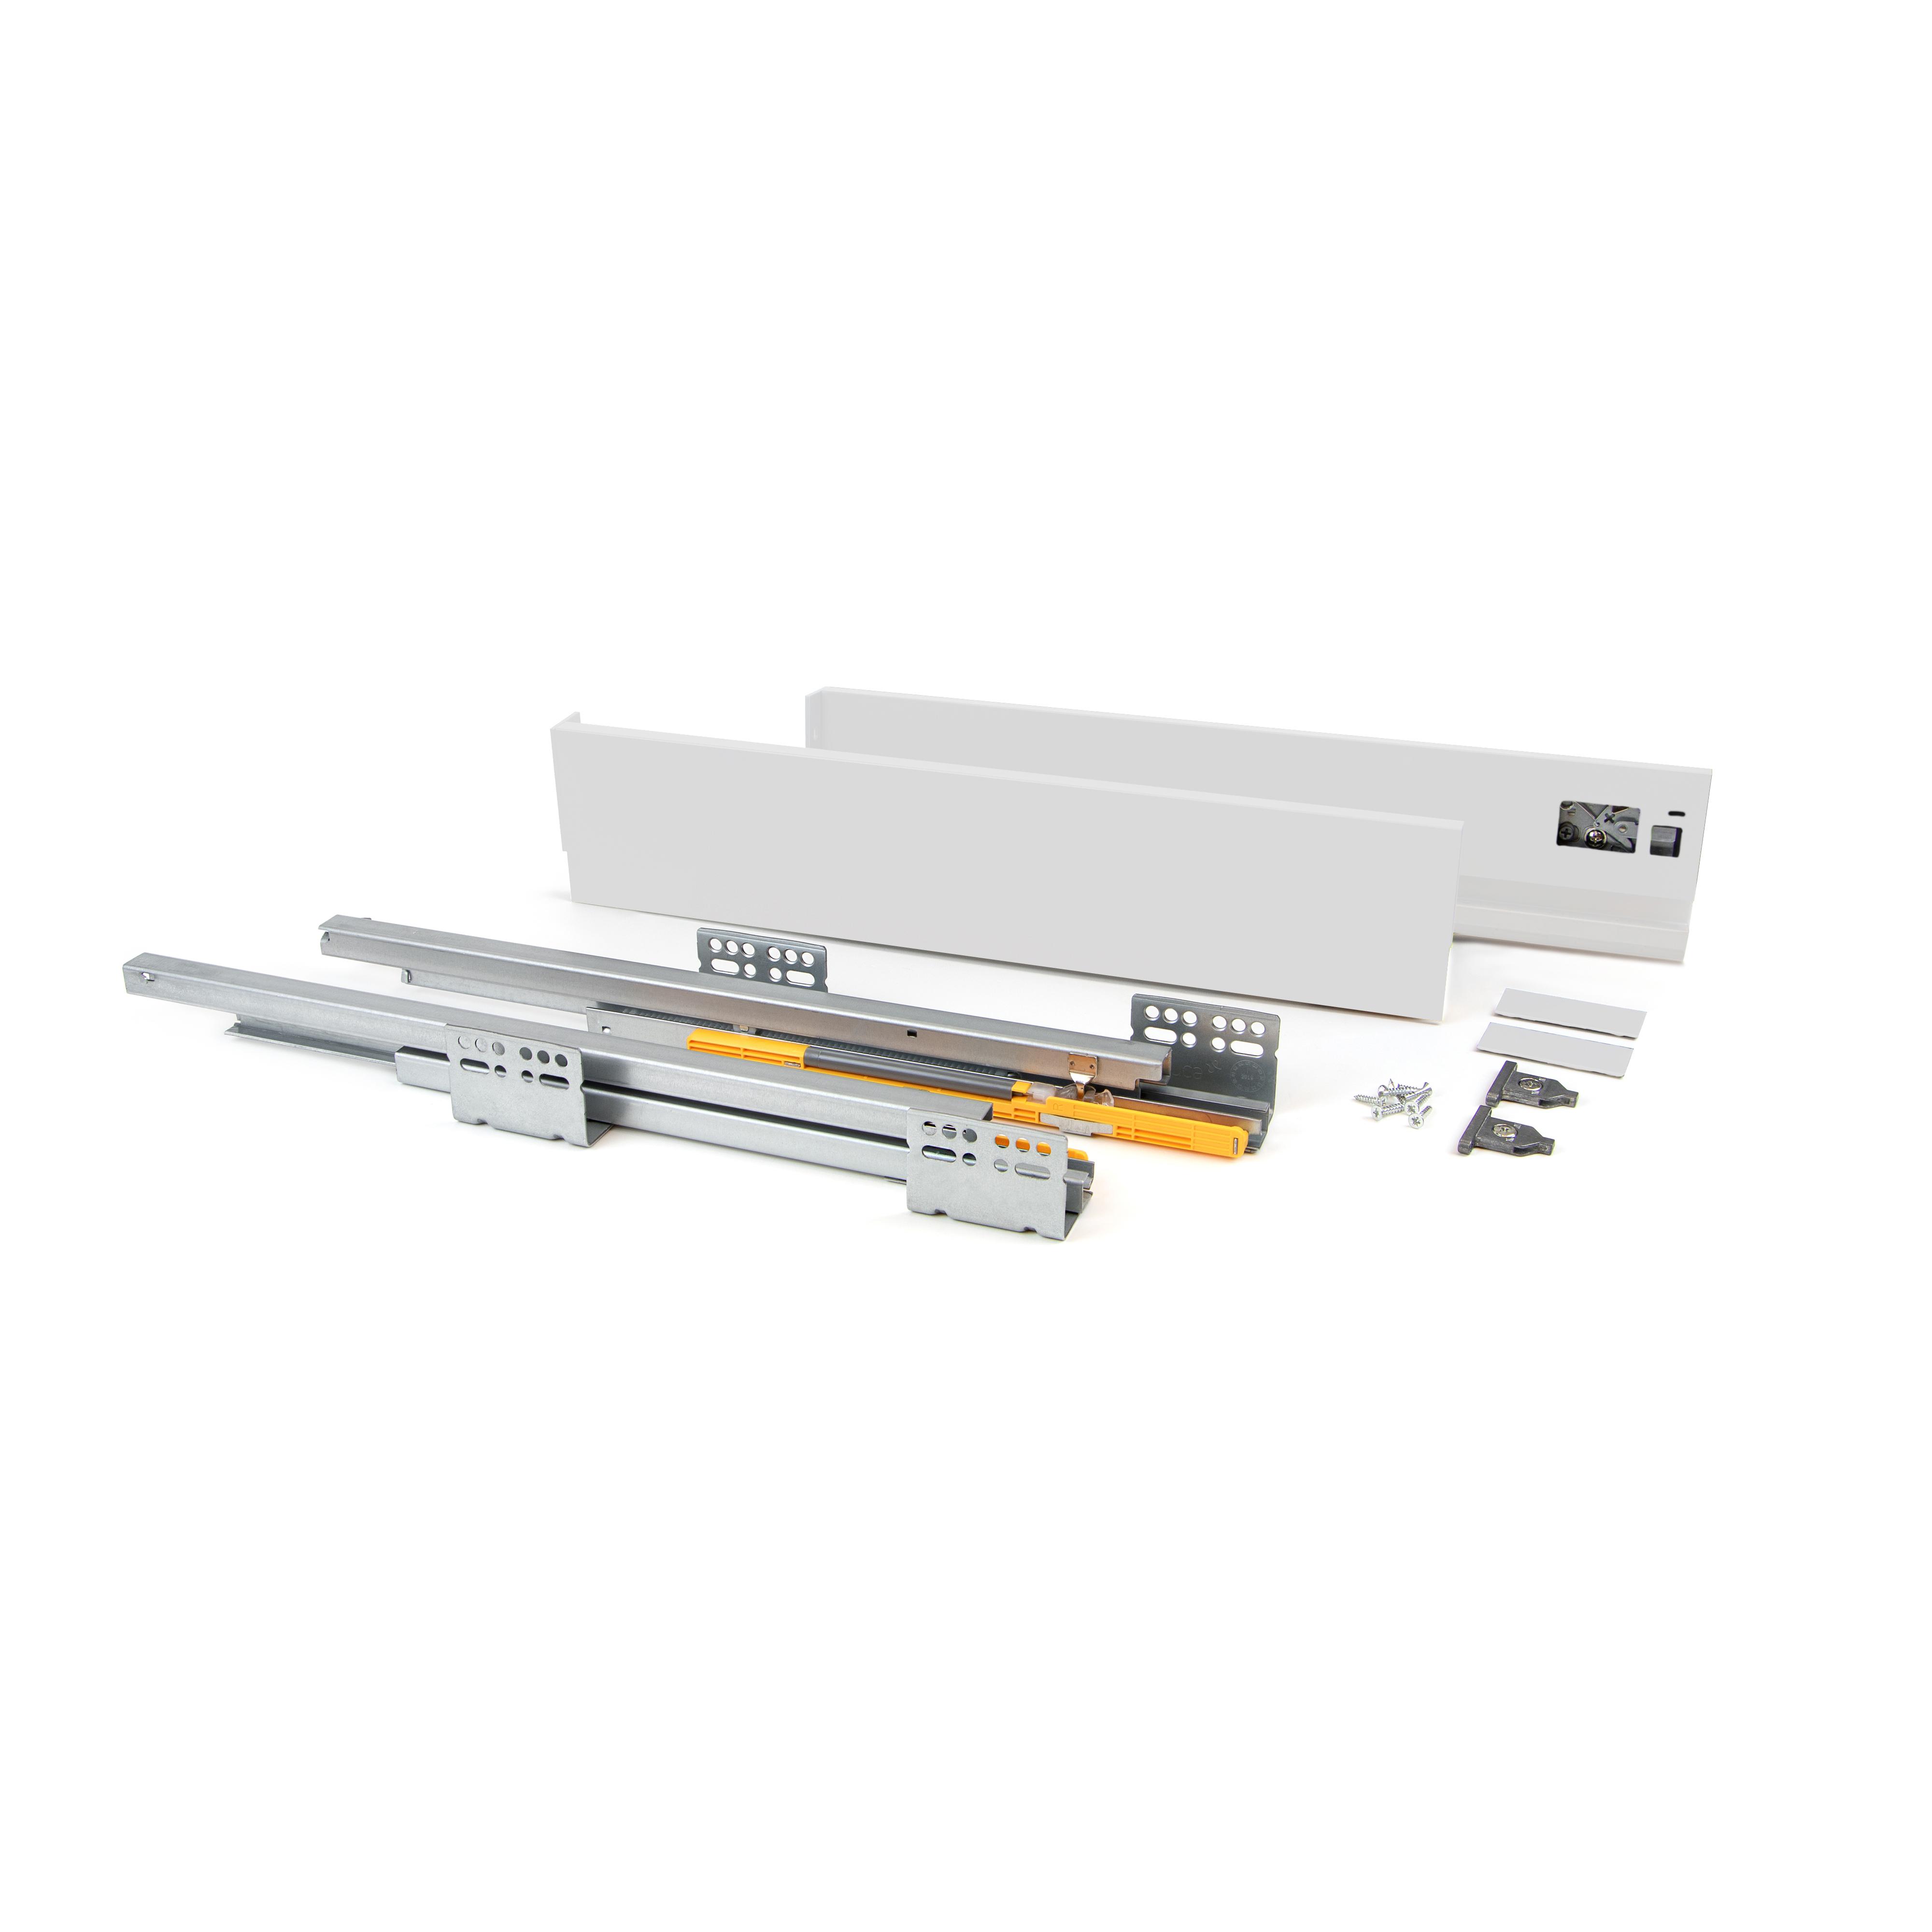 Emuca Kit cassetto per cucina Concept, altezza 105 mm, prof. 400 mm, chiusura soft, Acciaio, Bianco